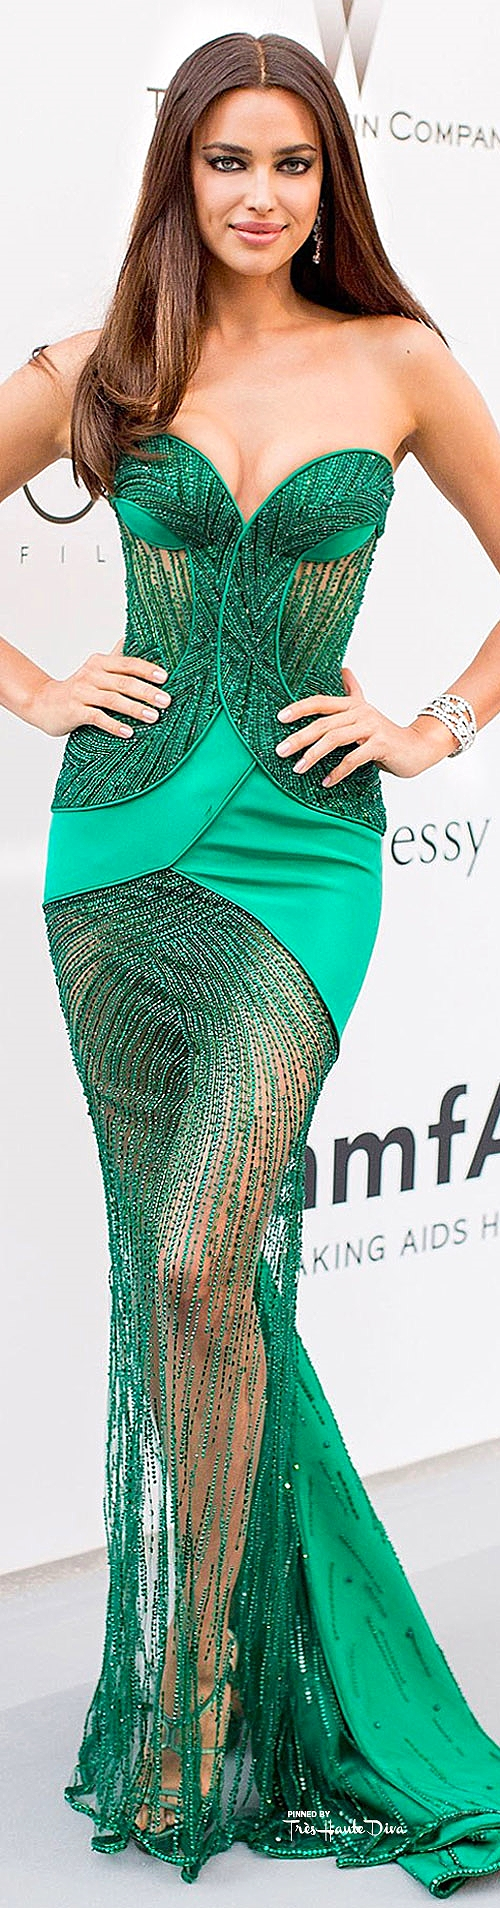 Irina Shayk in Atelier Versace with Harry Winston jewels vogue.uk.com/ Getty